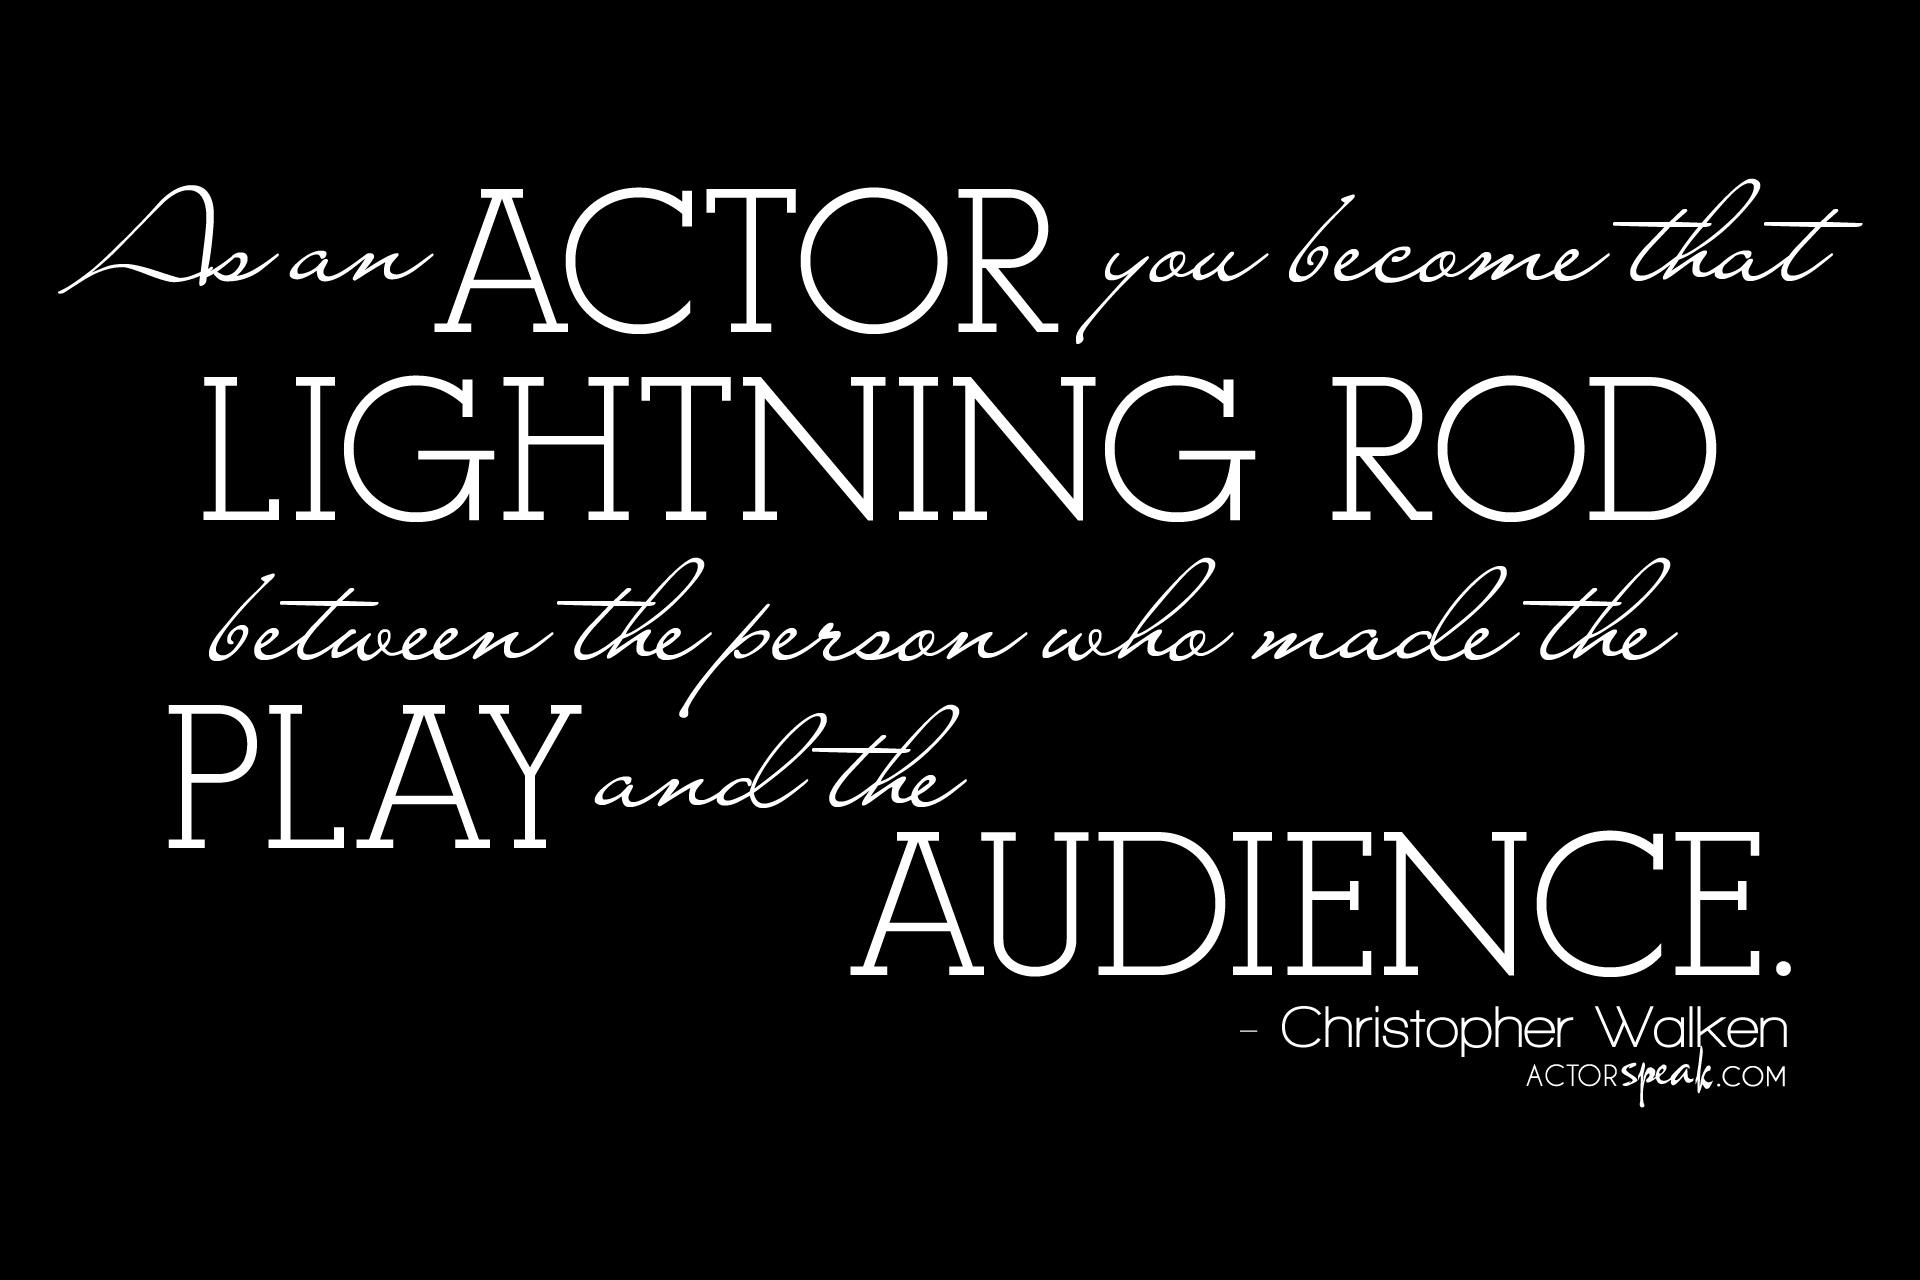 Funny Theater Quotes. QuotesGram